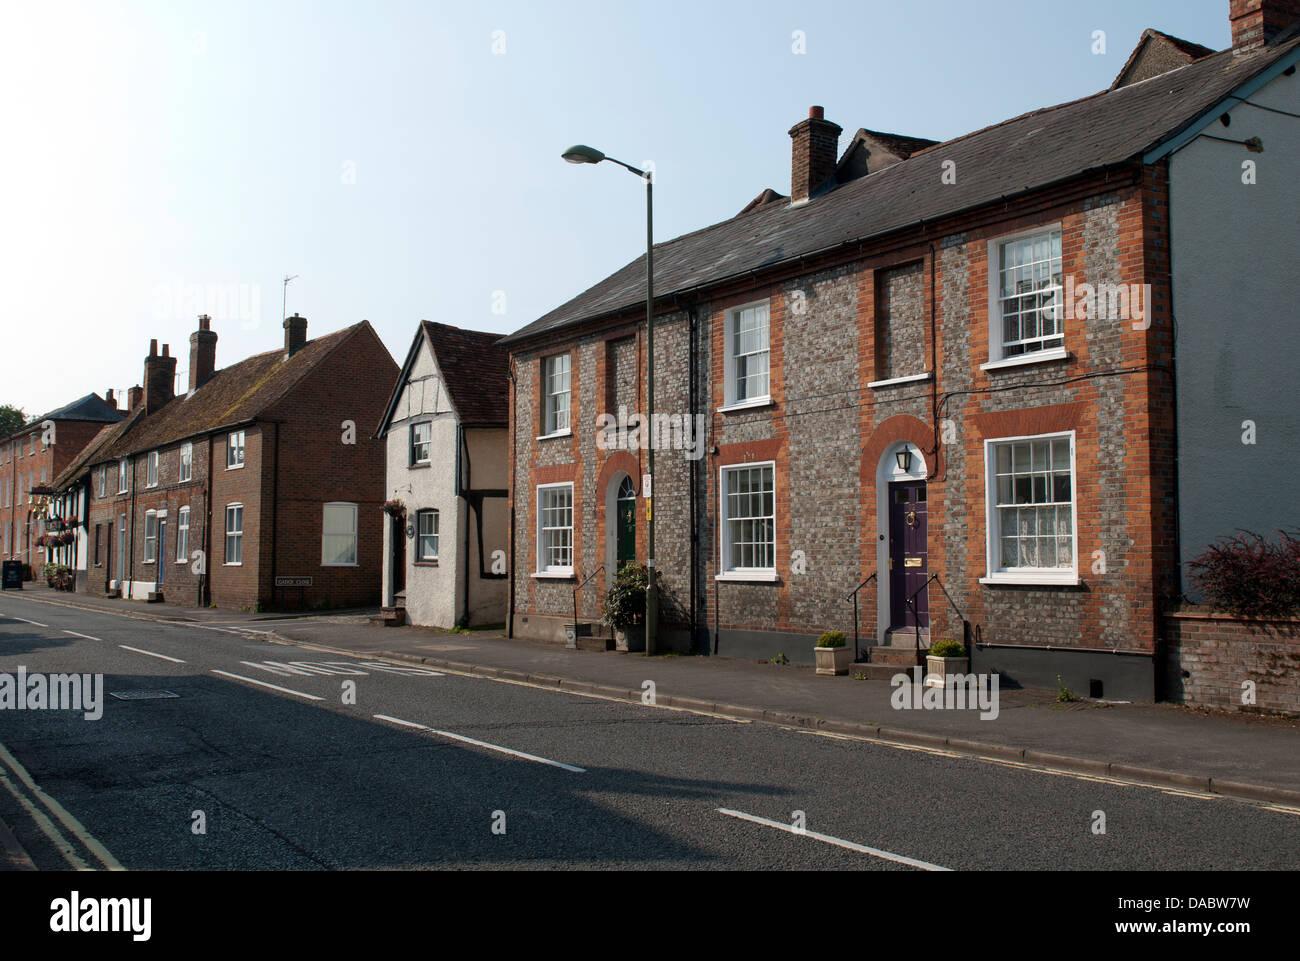 High Street, Thame, Oxfordshire, UK - Stock Image